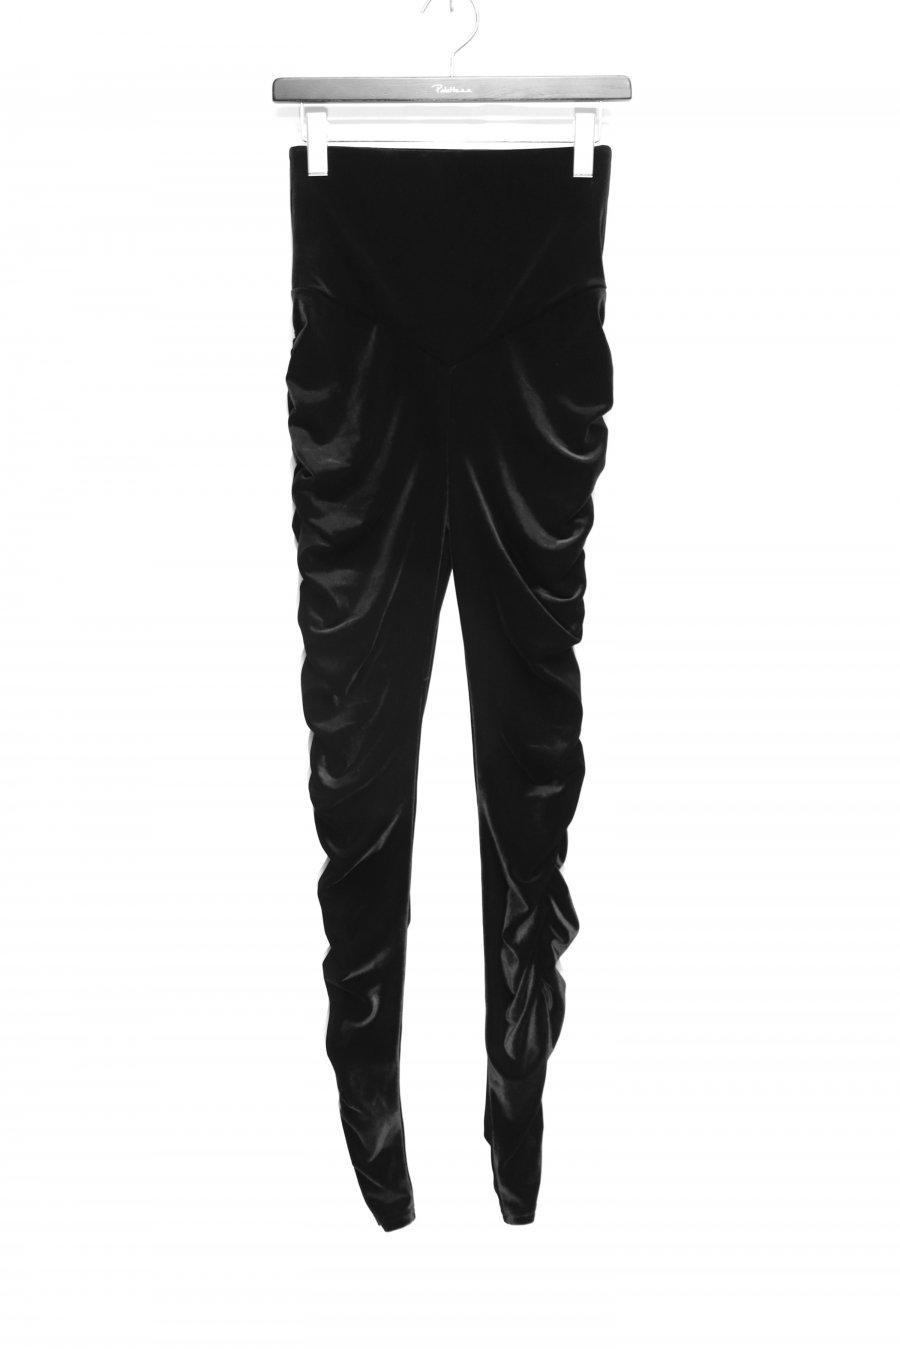 FETICO  Gathered velour leggins<img class='new_mark_img2' src='https://img.shop-pro.jp/img/new/icons15.gif' style='border:none;display:inline;margin:0px;padding:0px;width:auto;' />